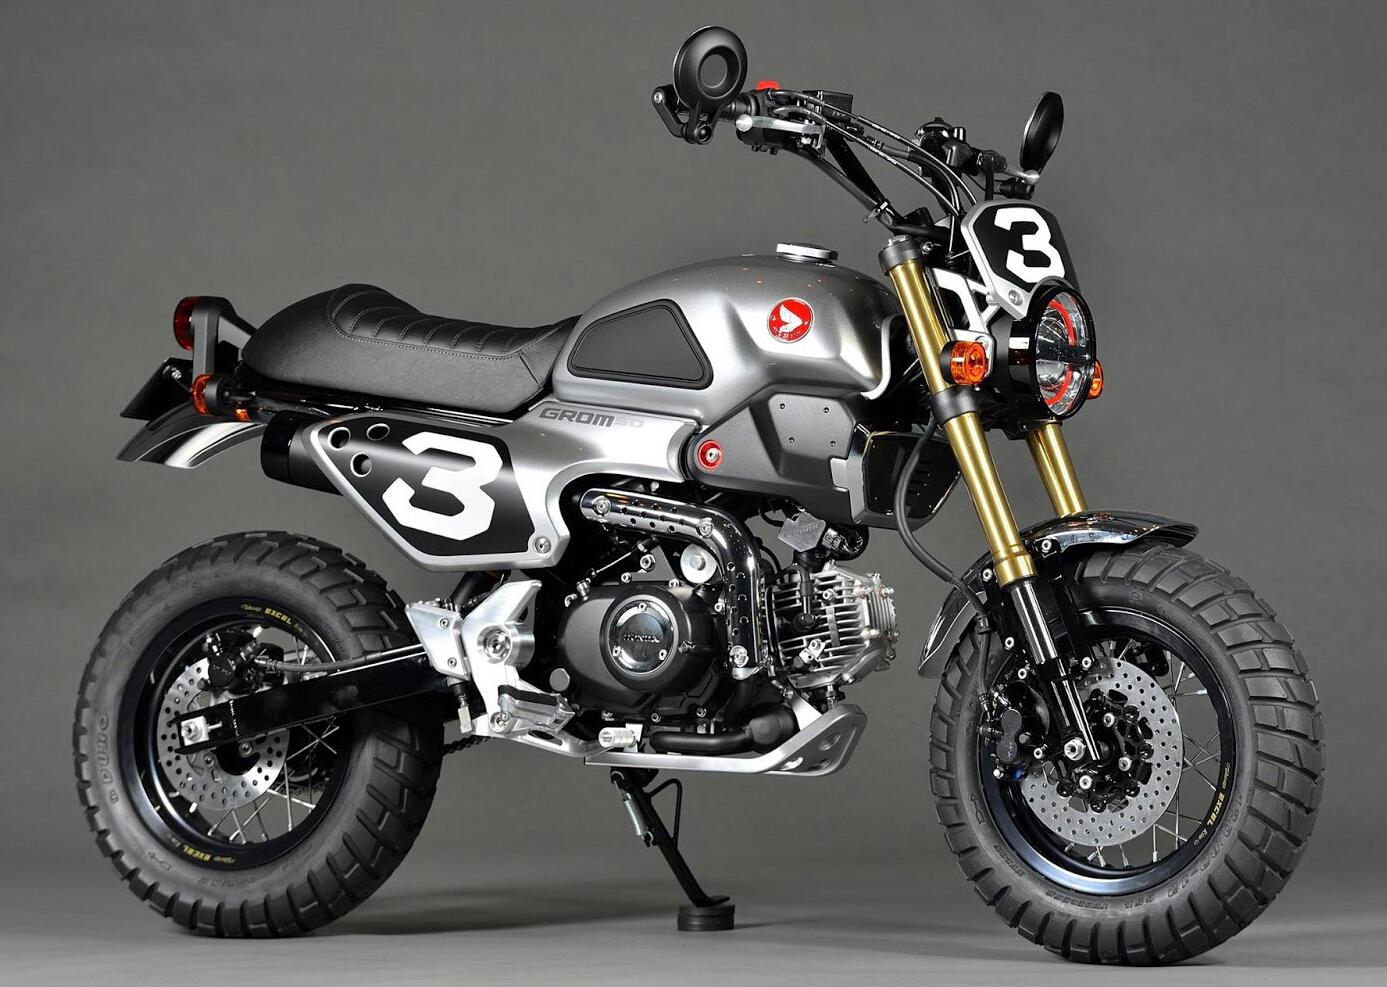 hight resolution of  custom honda grom 50 scrambler motorcycle msx 125 jpg